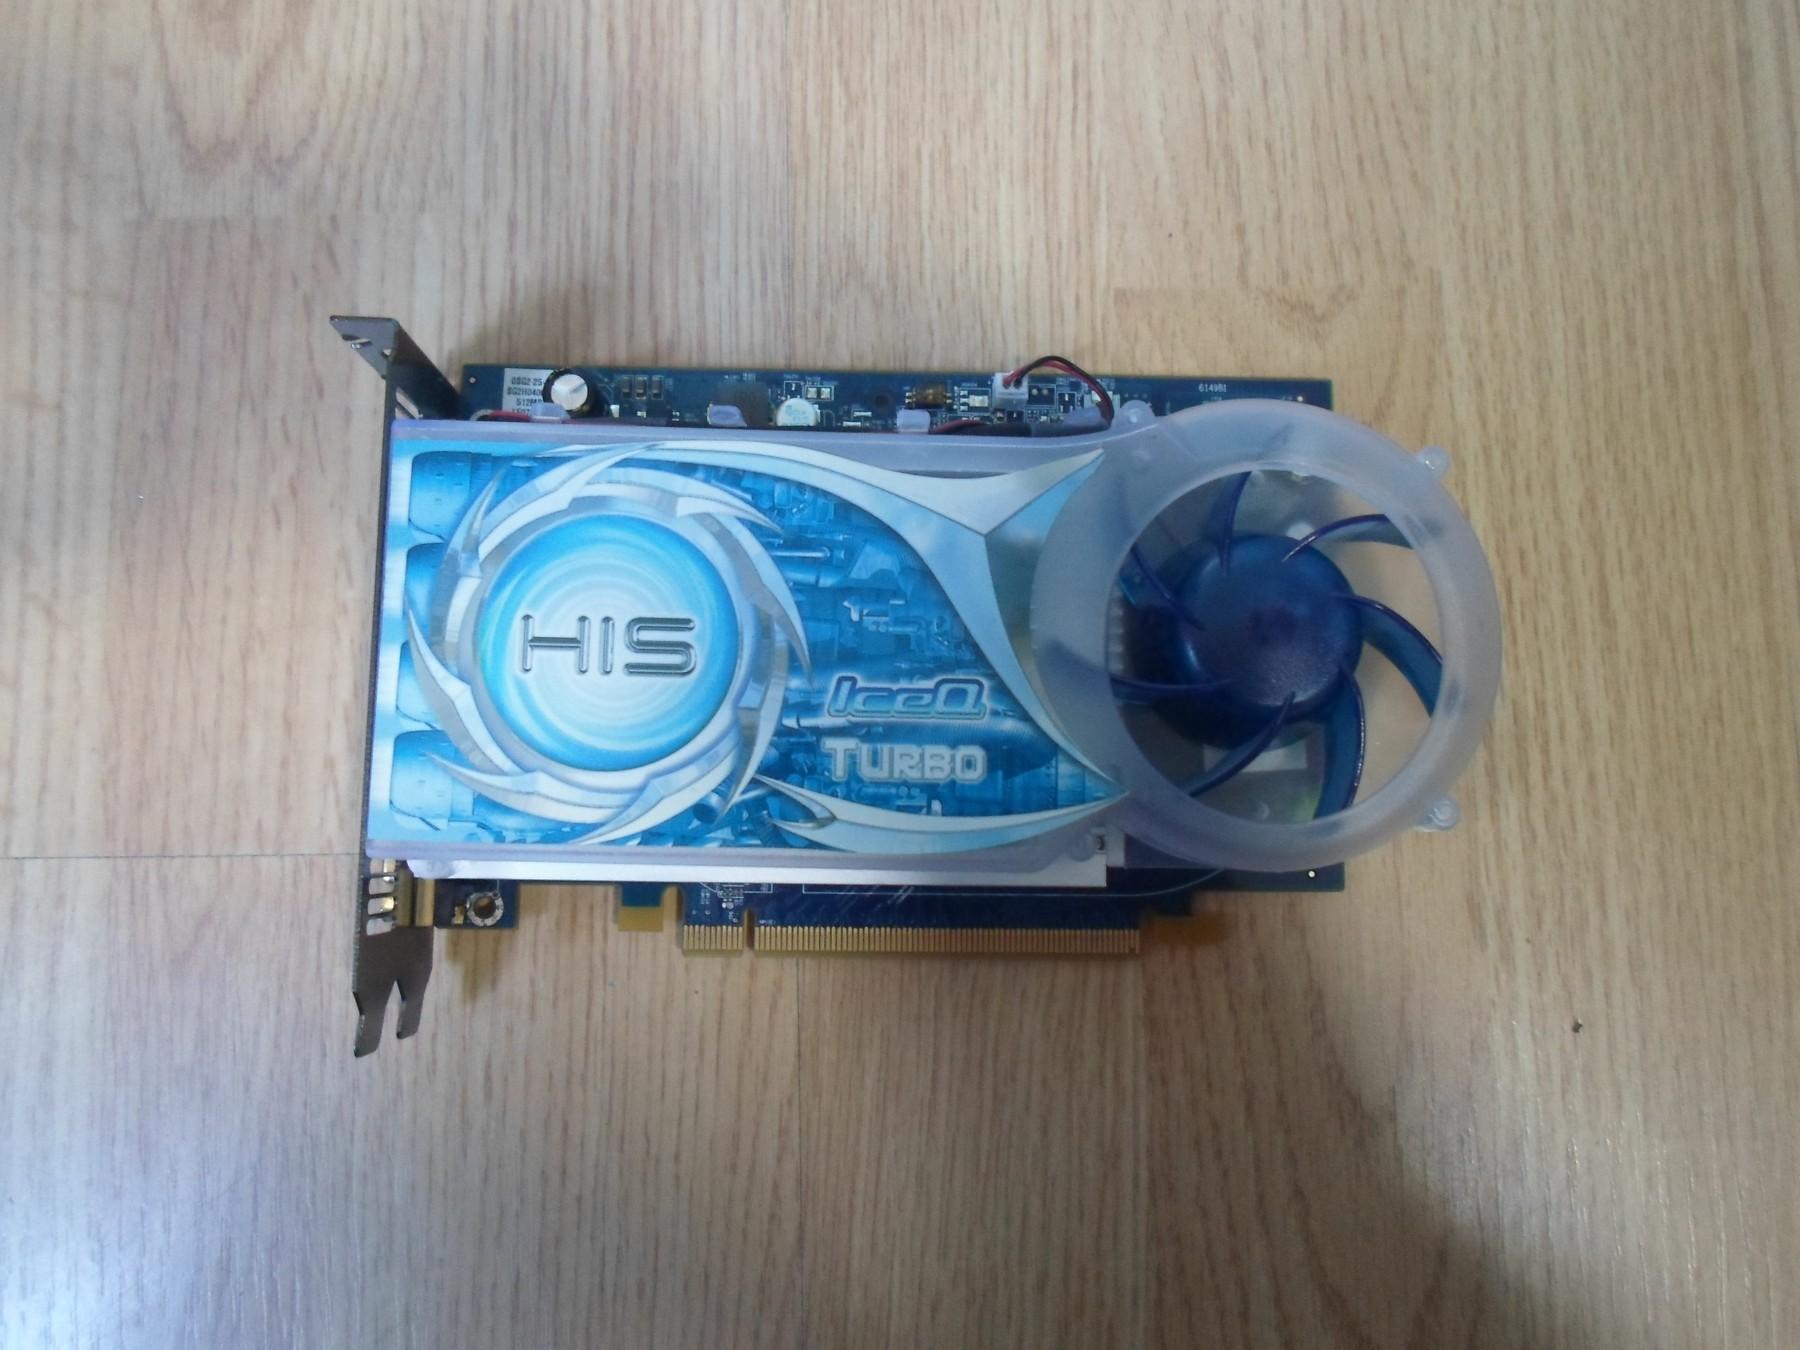 HIS HD 2600PRO IceQ Turbo 512MB PCIe - Kupindo.com (46808117)